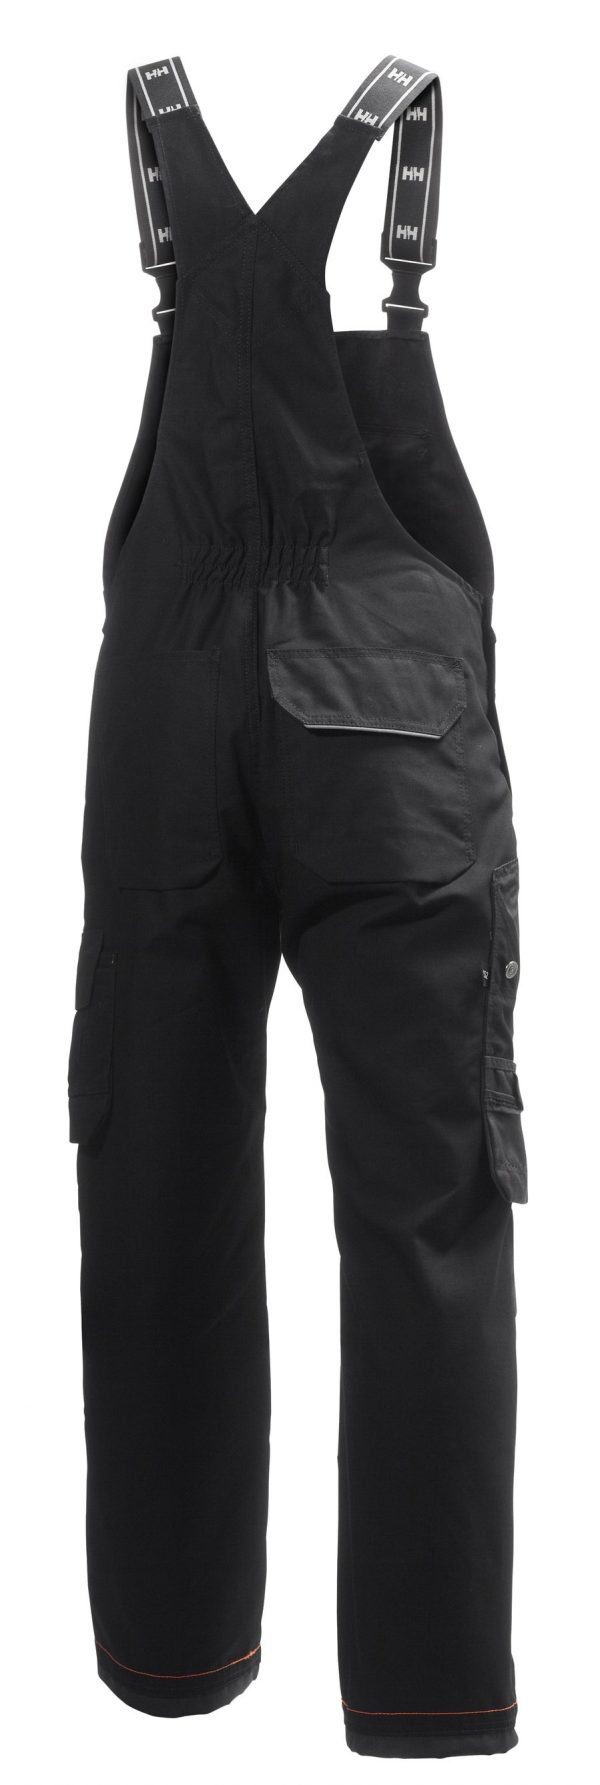 76541 Helly Hansen Workwear Men's Chelsea Construction Bib Pant w/ Cordura® Reinforcement, Hammer Holster & Hanging Pockets, Black Back